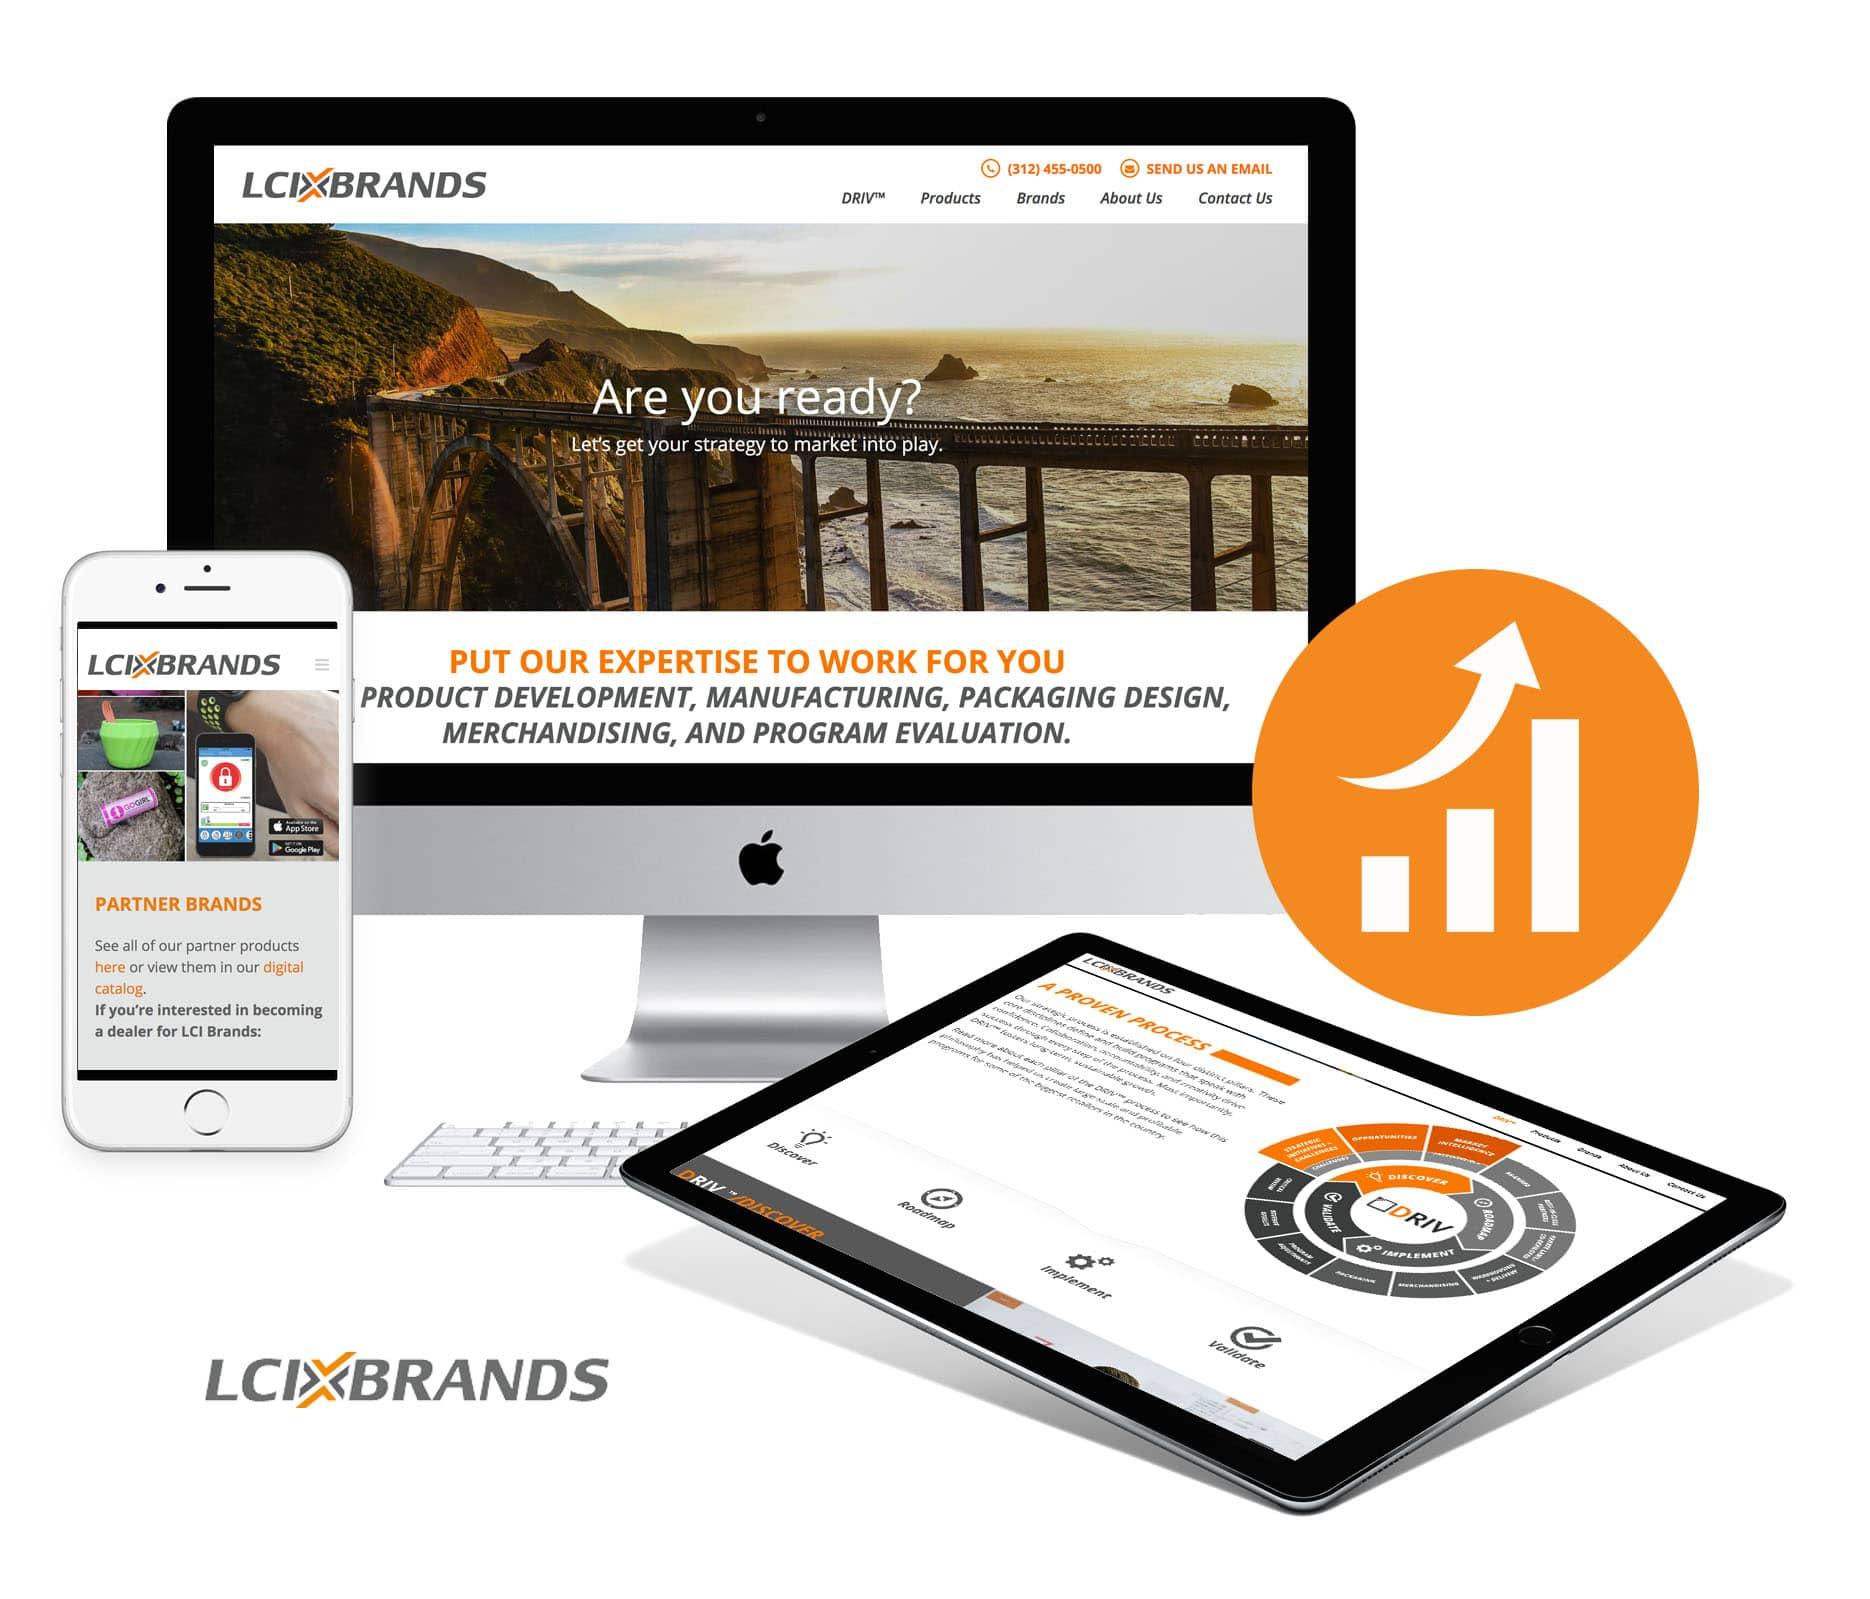 LCI Brands Enterprise Level B2B Website